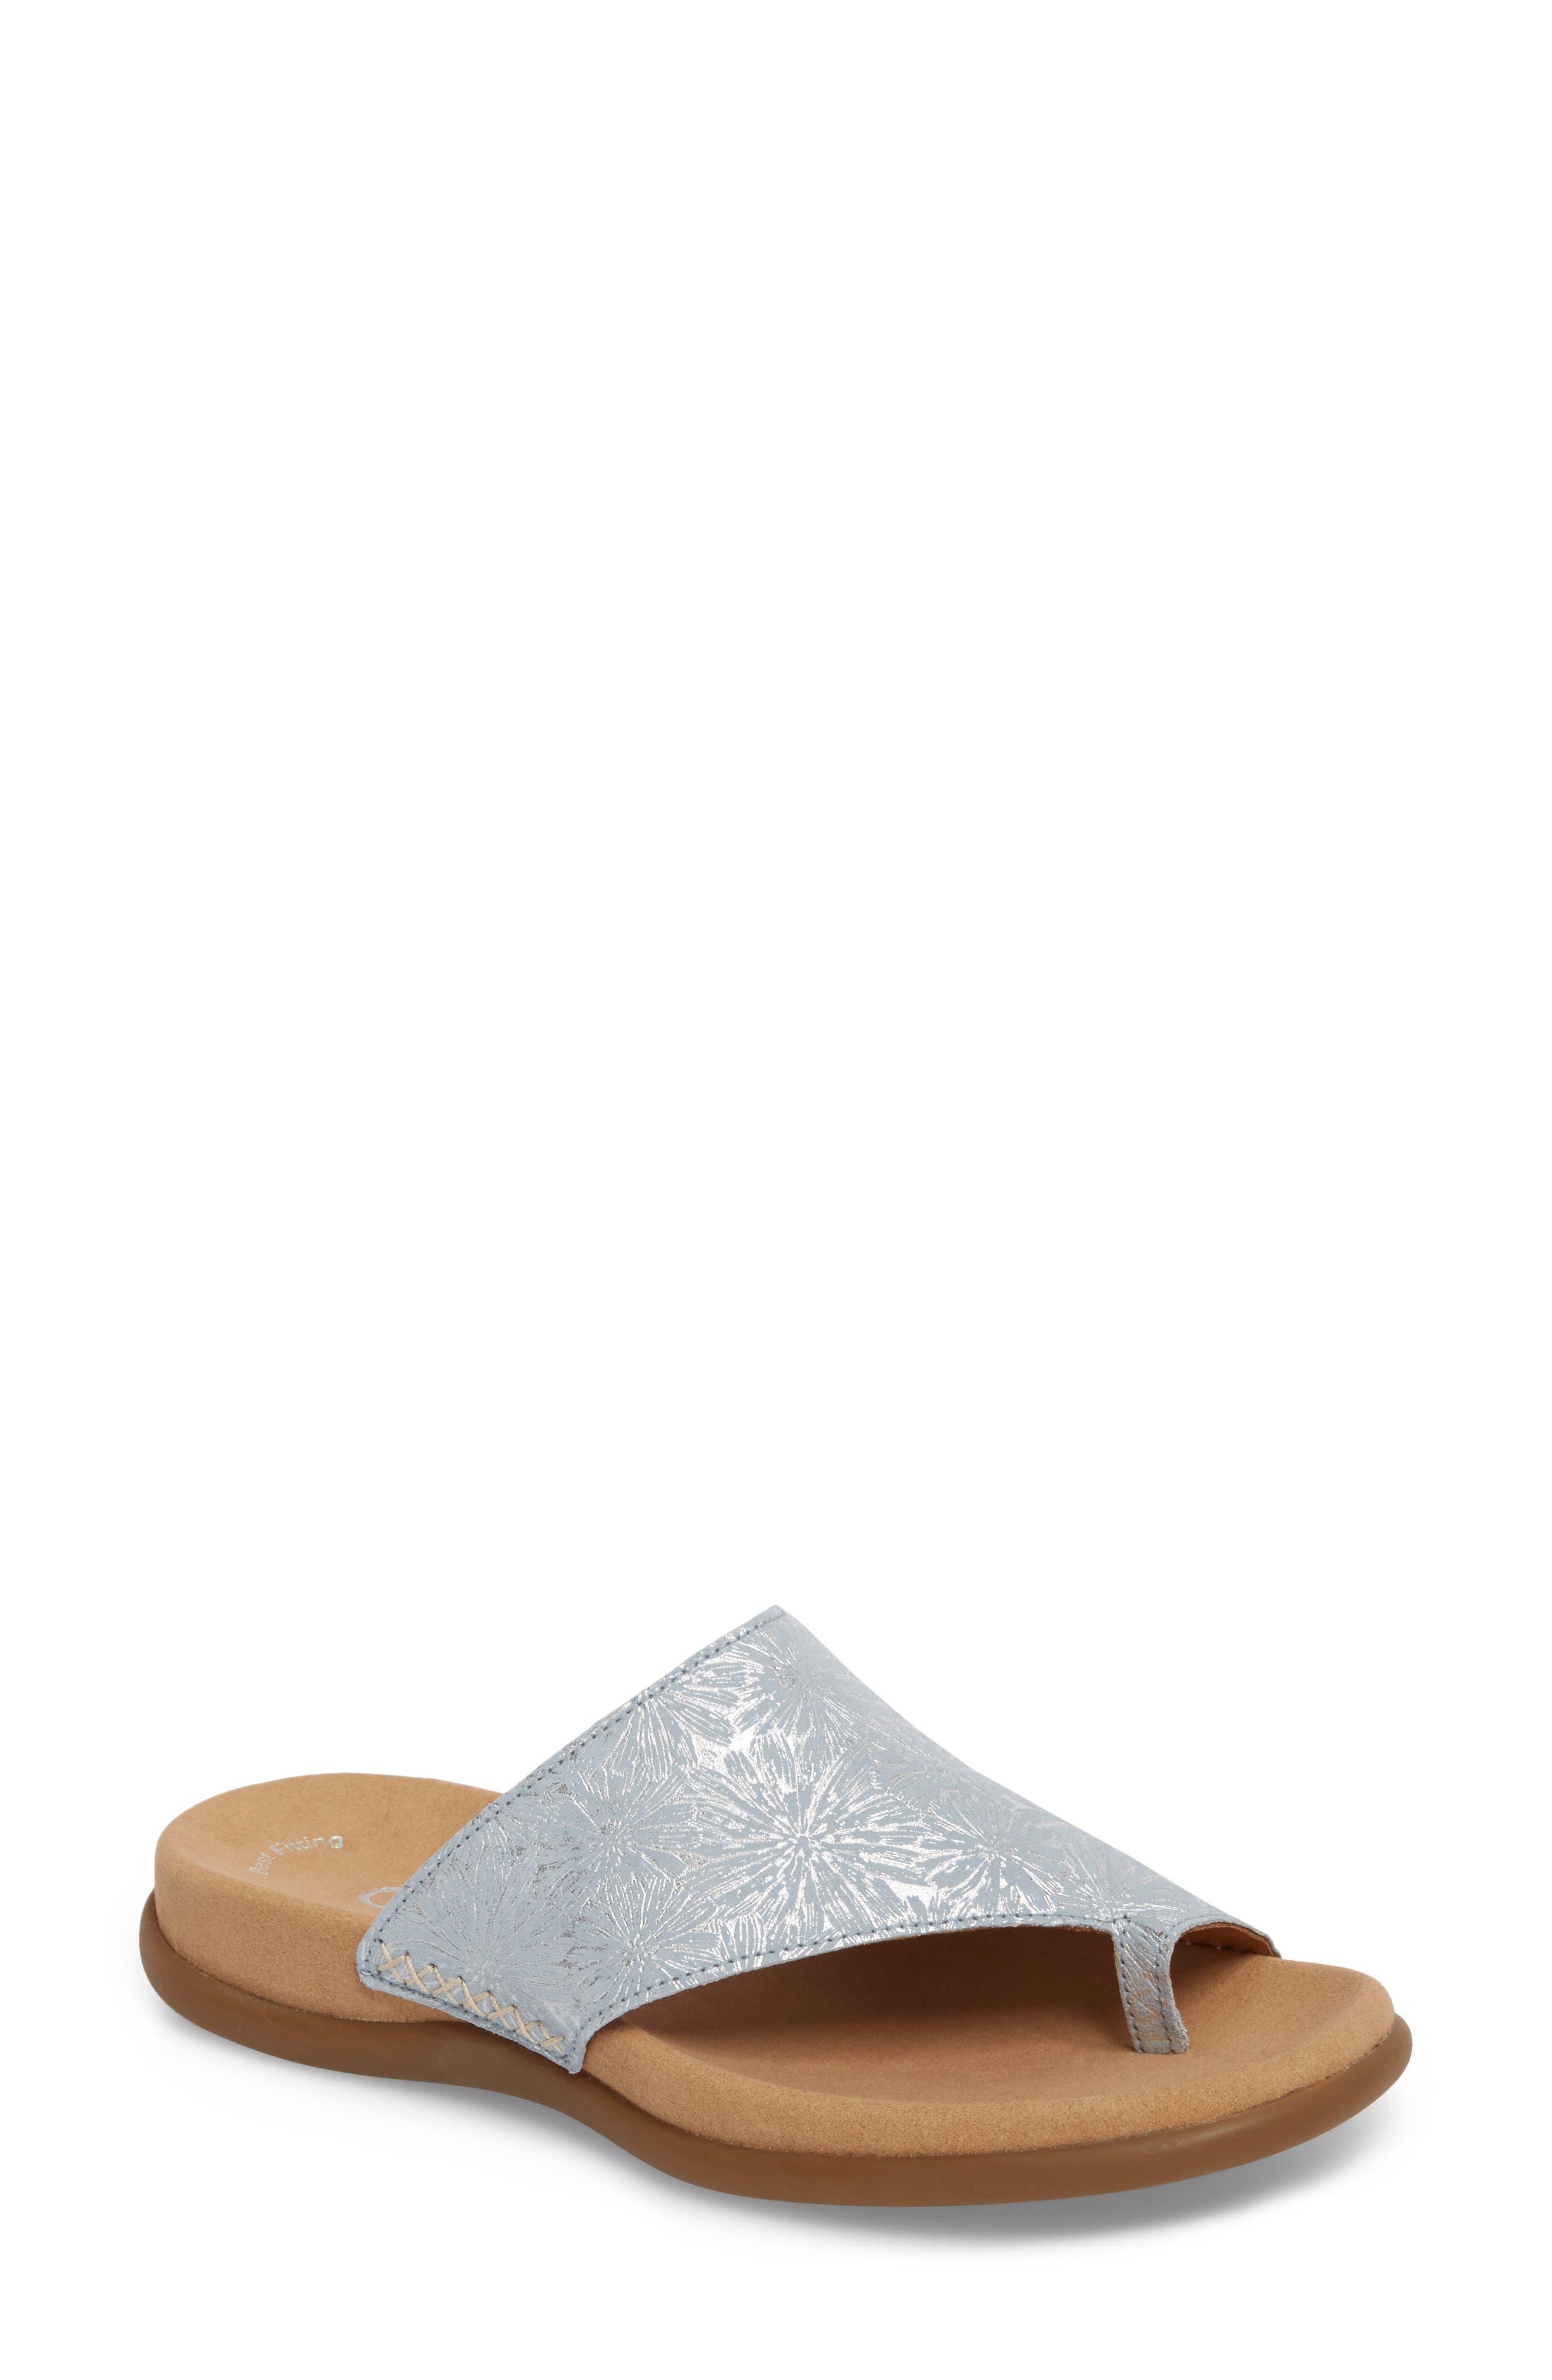 Sandal,                         Main,                         color, BLUE METALLIC LEATHER